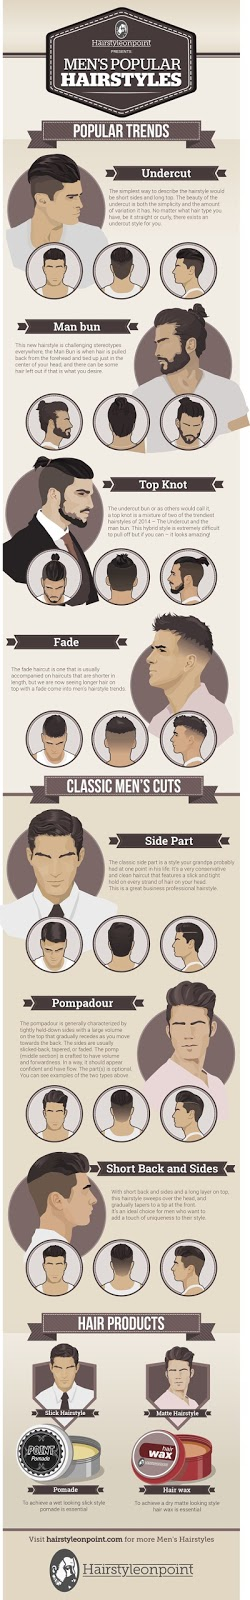 Infographic Tutorial infographic tutorials point : Men's haircuts video tutorials!